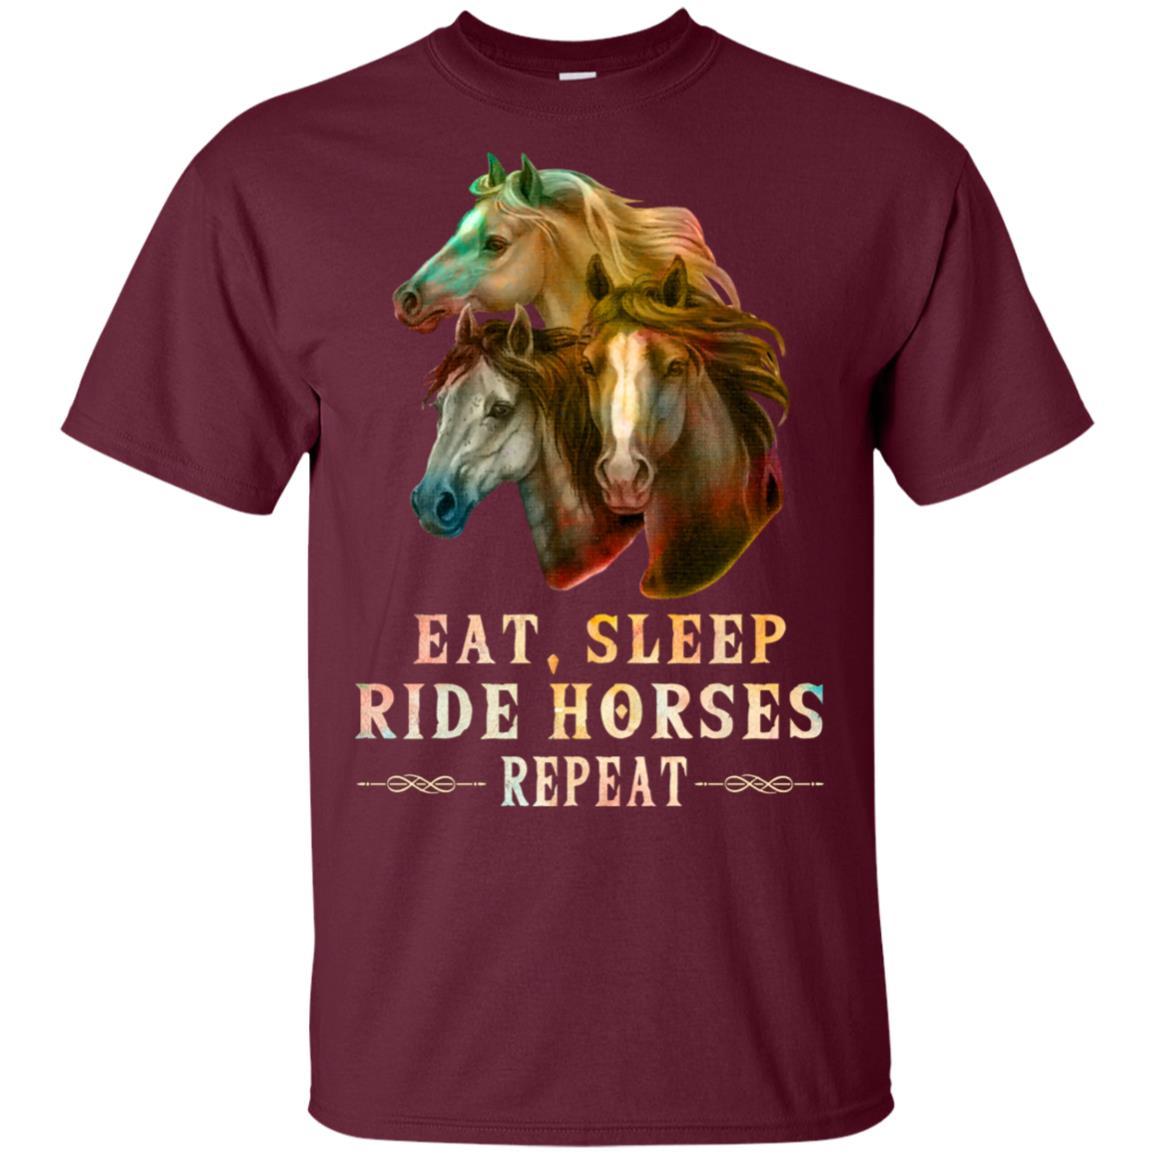 Eat Sleep Ride Horses Repeat Unisex Short Sleeve